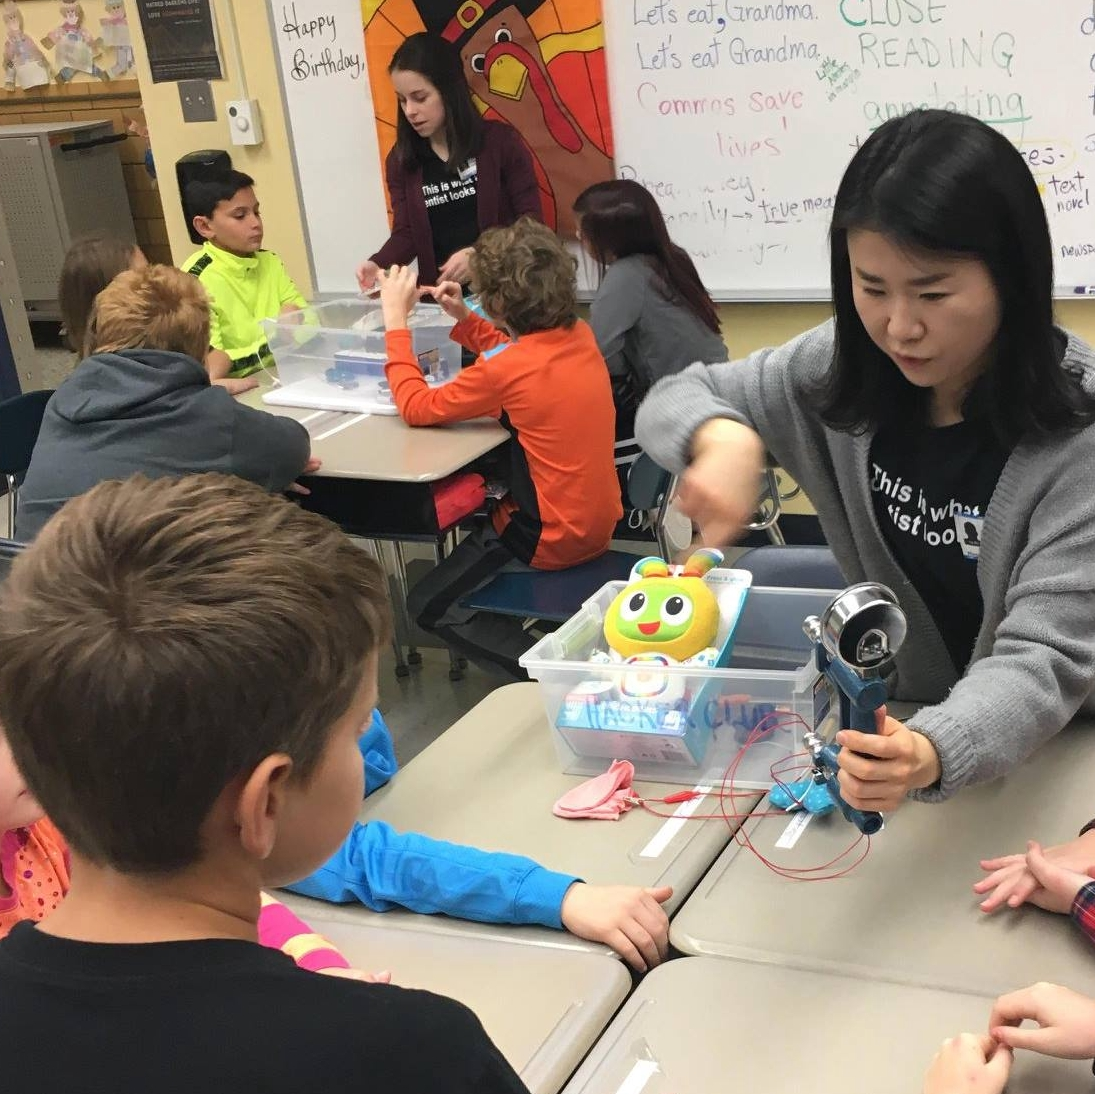 Promoting STEM in local K-12 schools